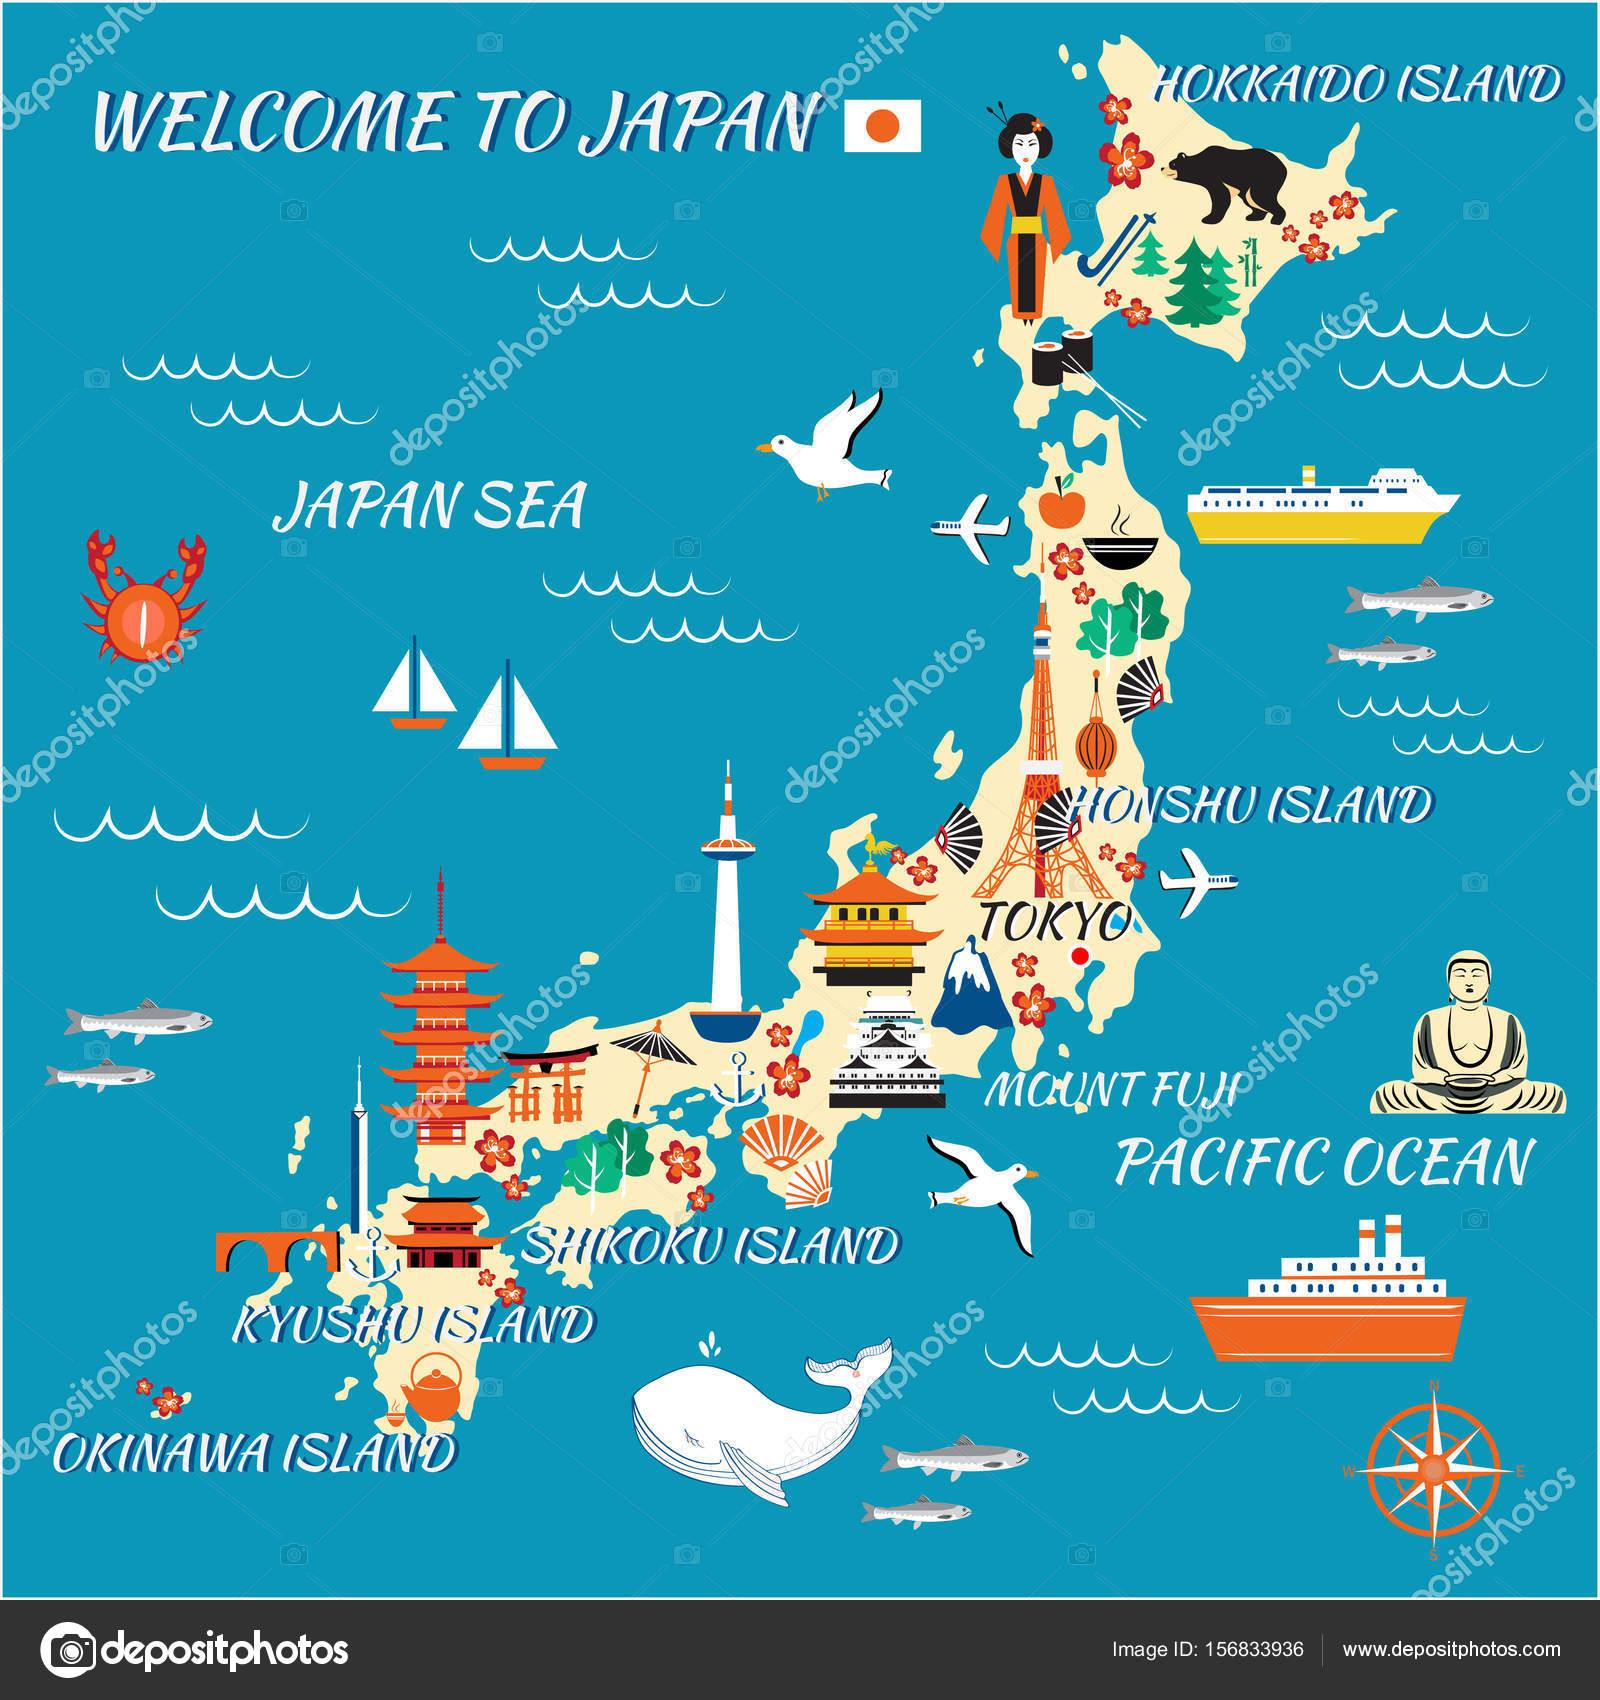 Japan cartoon travel map vector illustration landmark Kinkaku JI